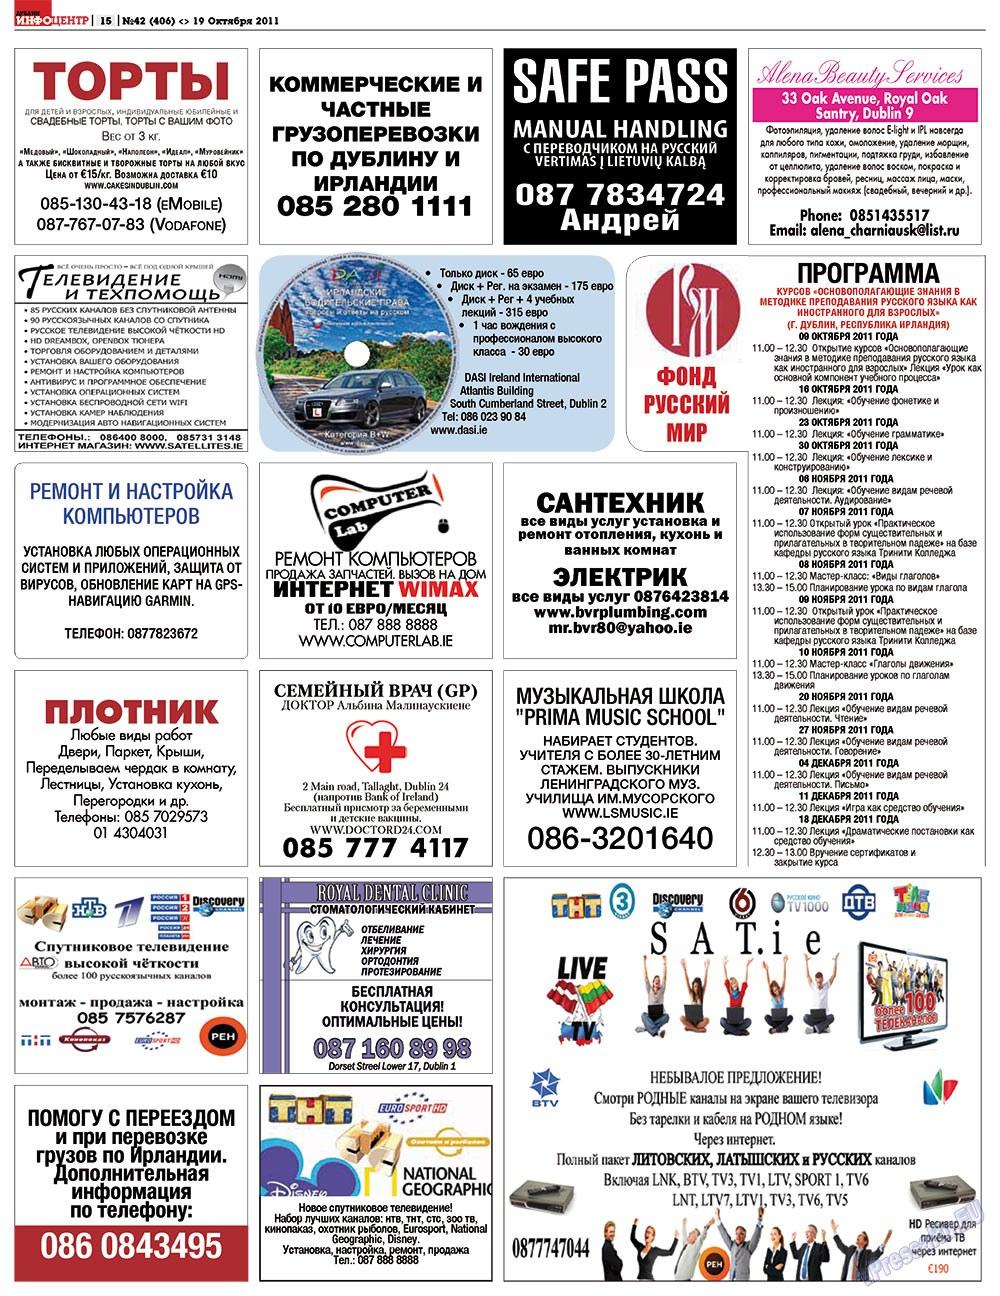 Дублин инфоцентр (газета). 2011 год, номер 42, стр. 15